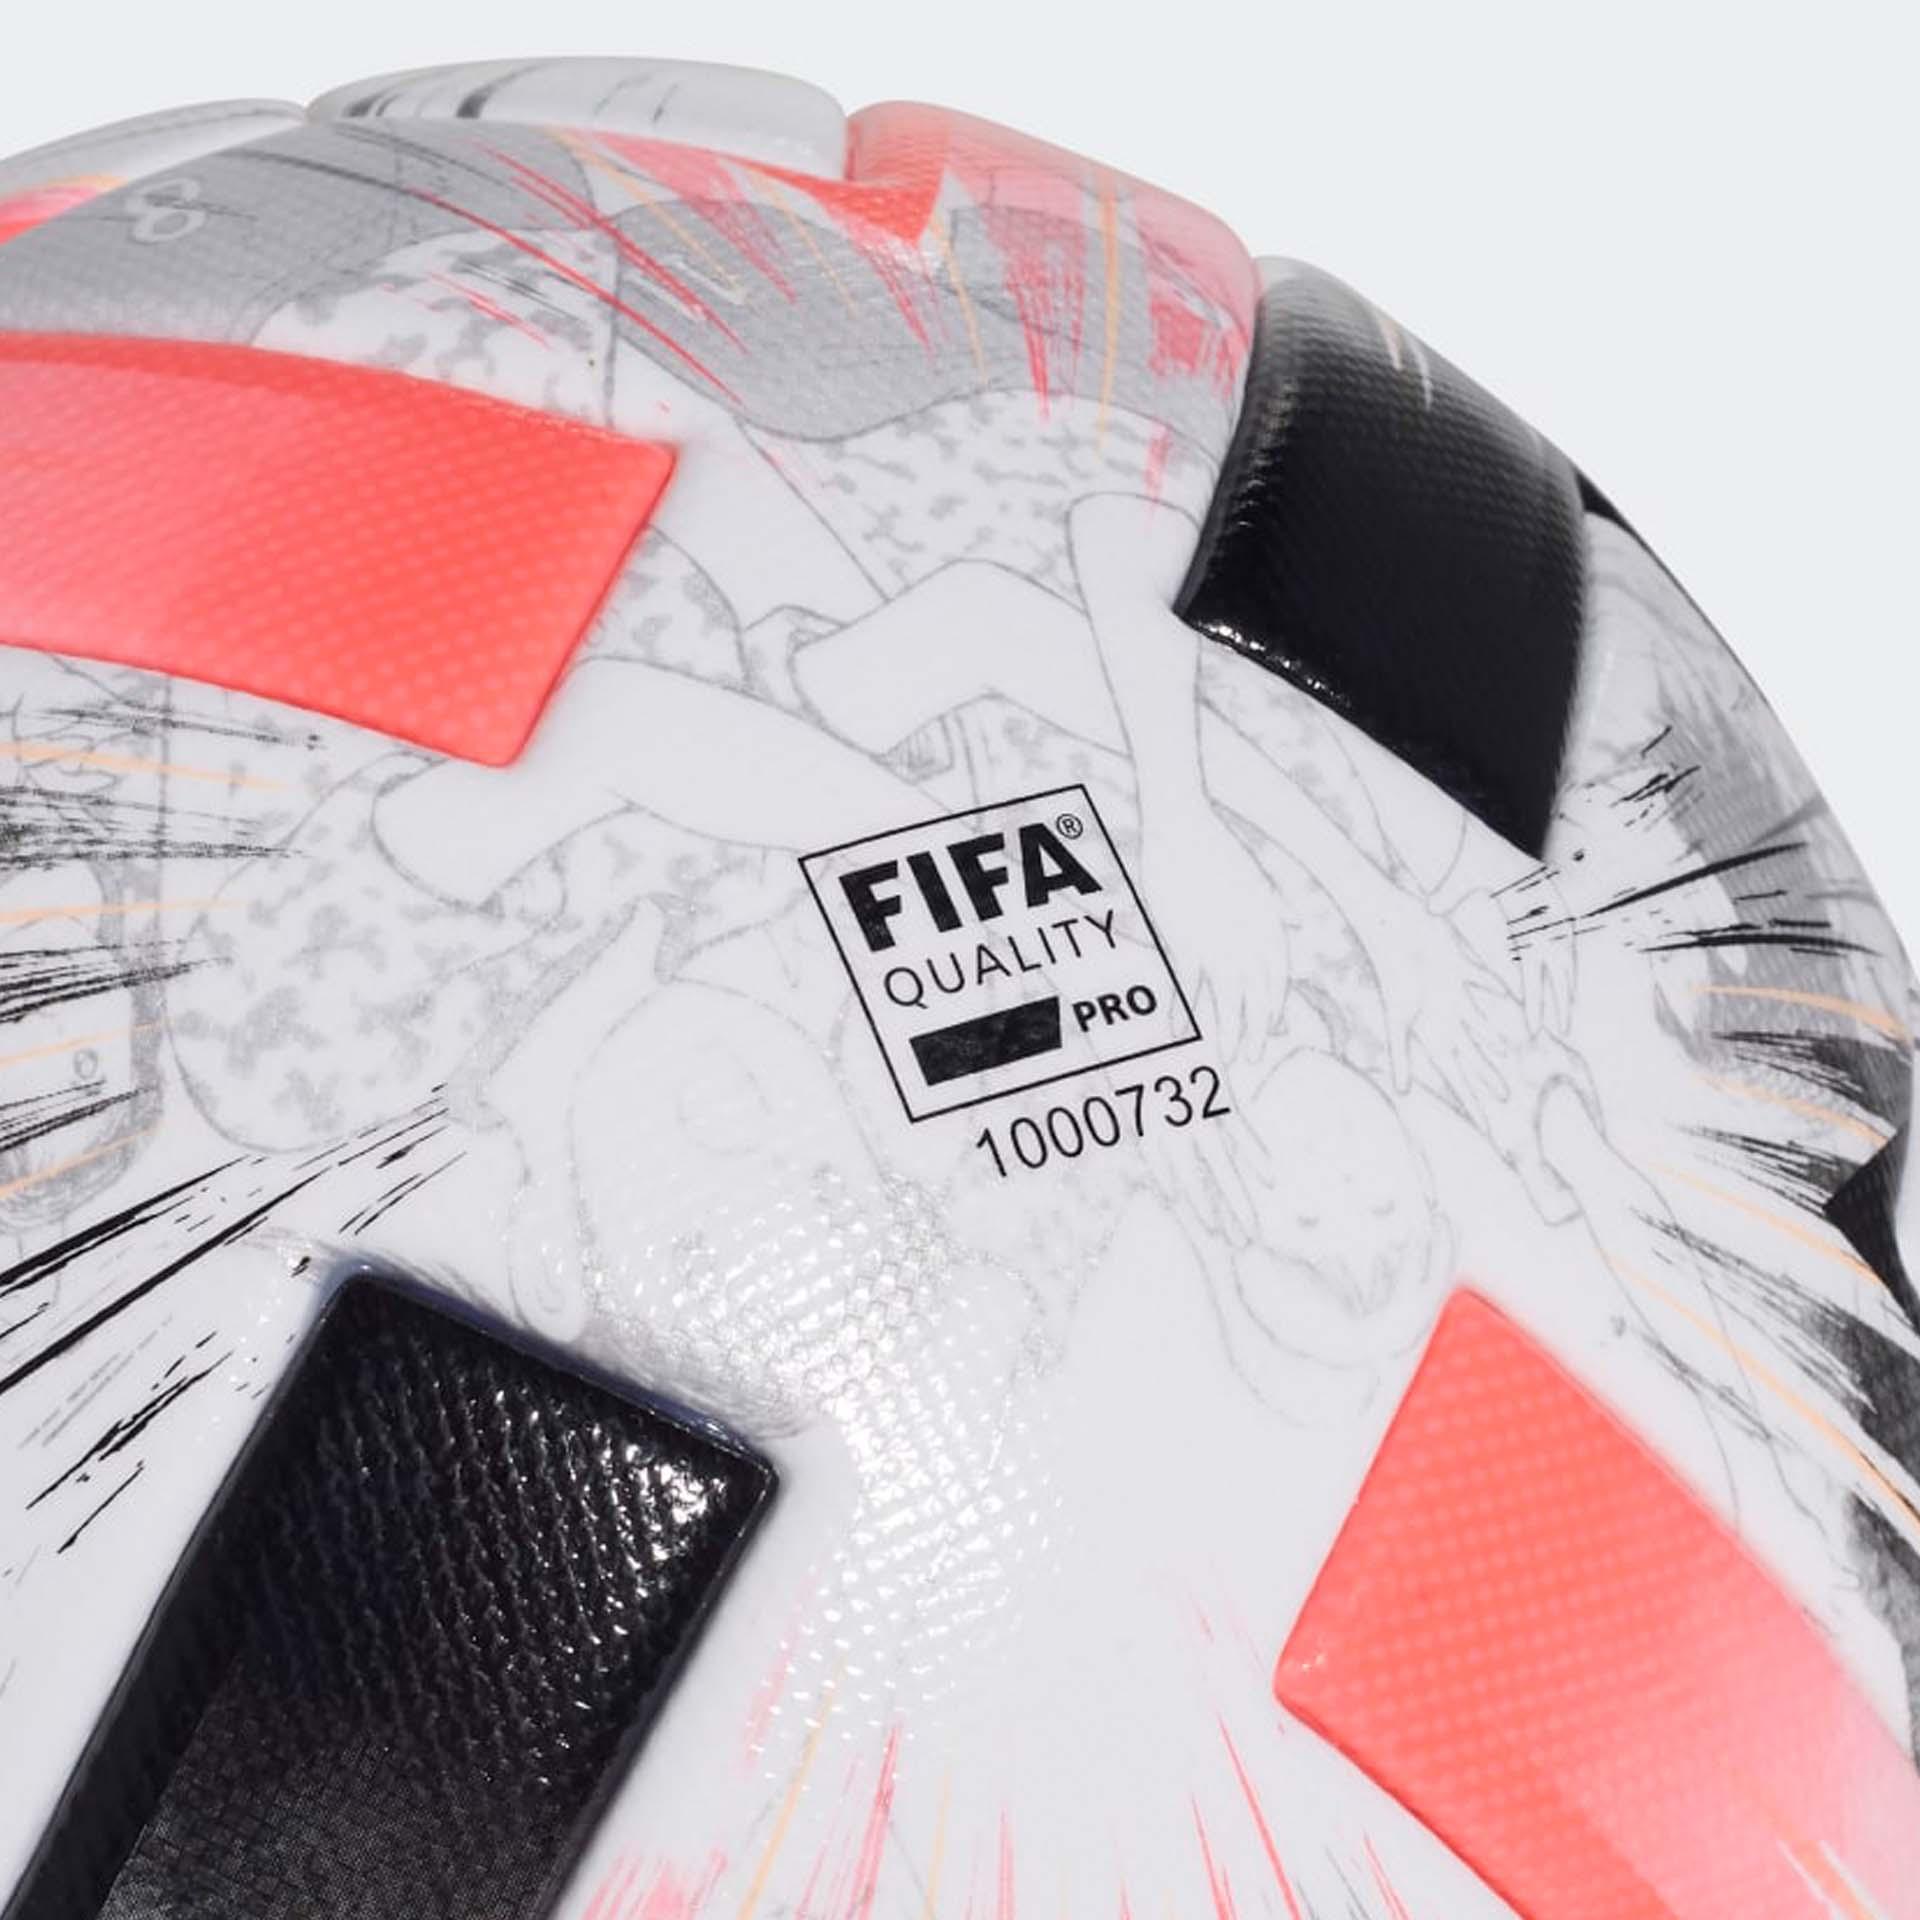 Adidas Launch The Captain Tsubasa 2020 Olympic Ball Soccerbible